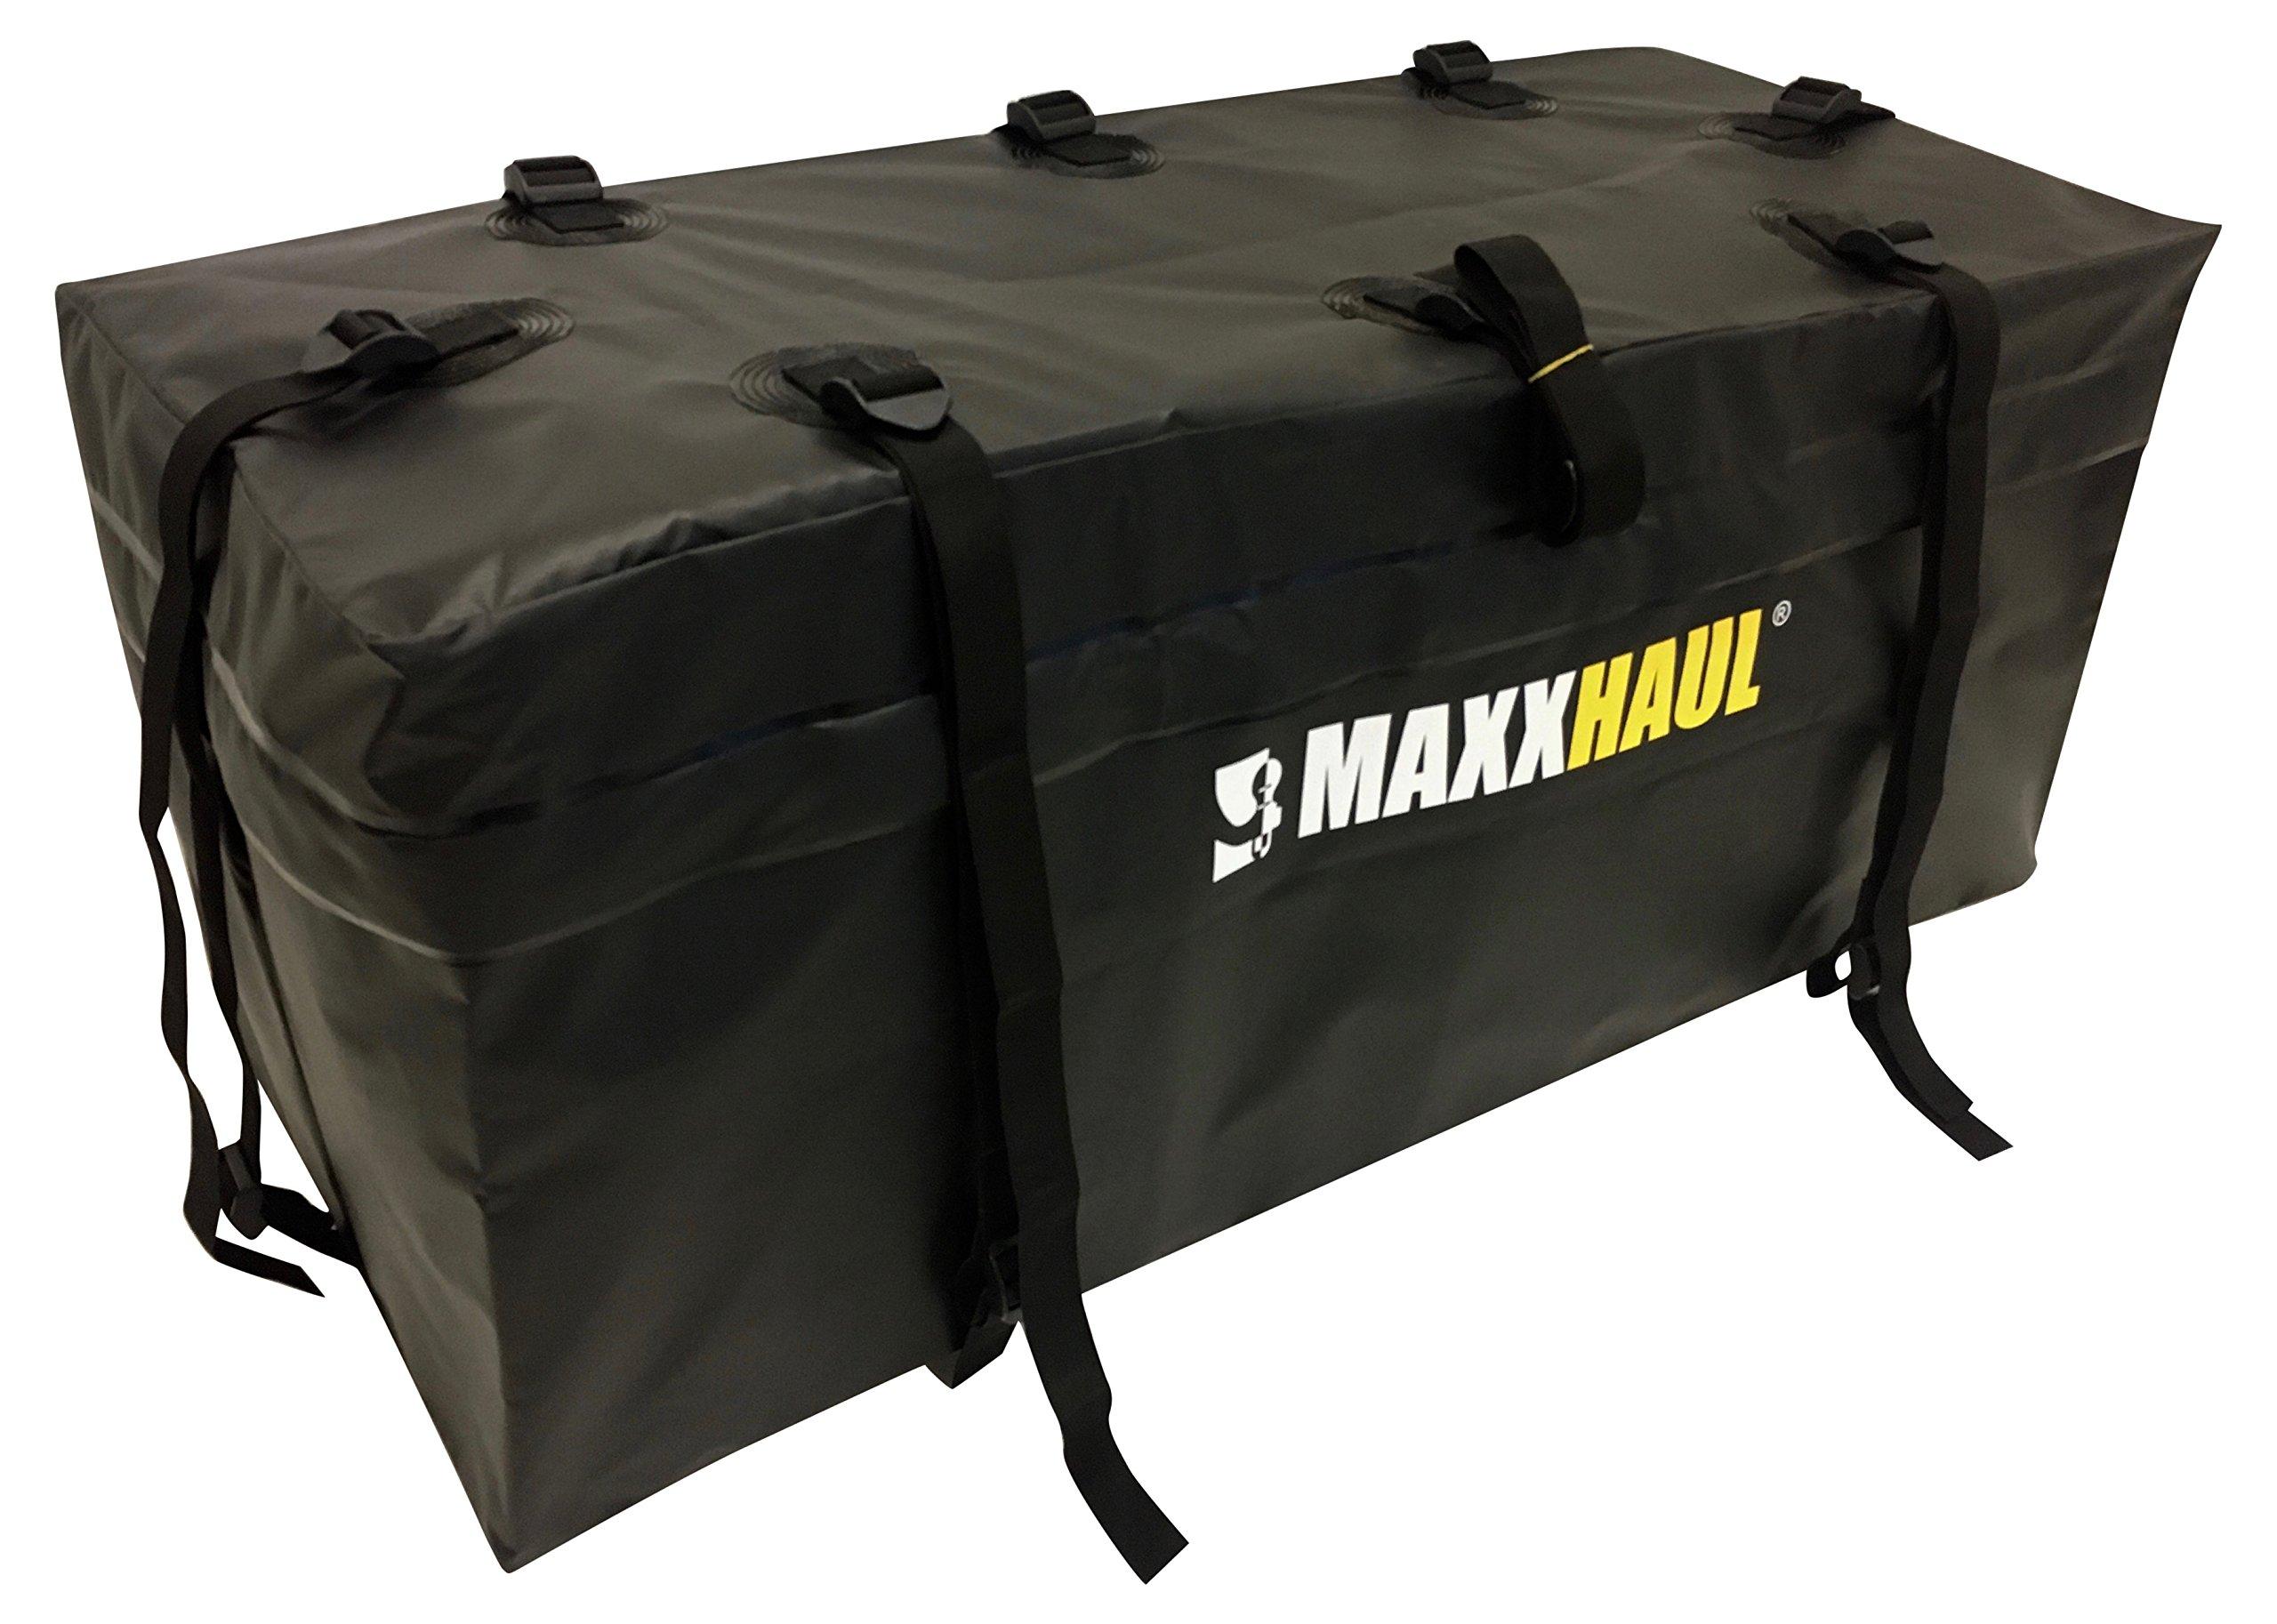 MaxxHaul 70209 Hitch Mount Waterproof/Rainproof Cargo Carrier Bag 47'' x 20'' x 20'' by MaxxHaul